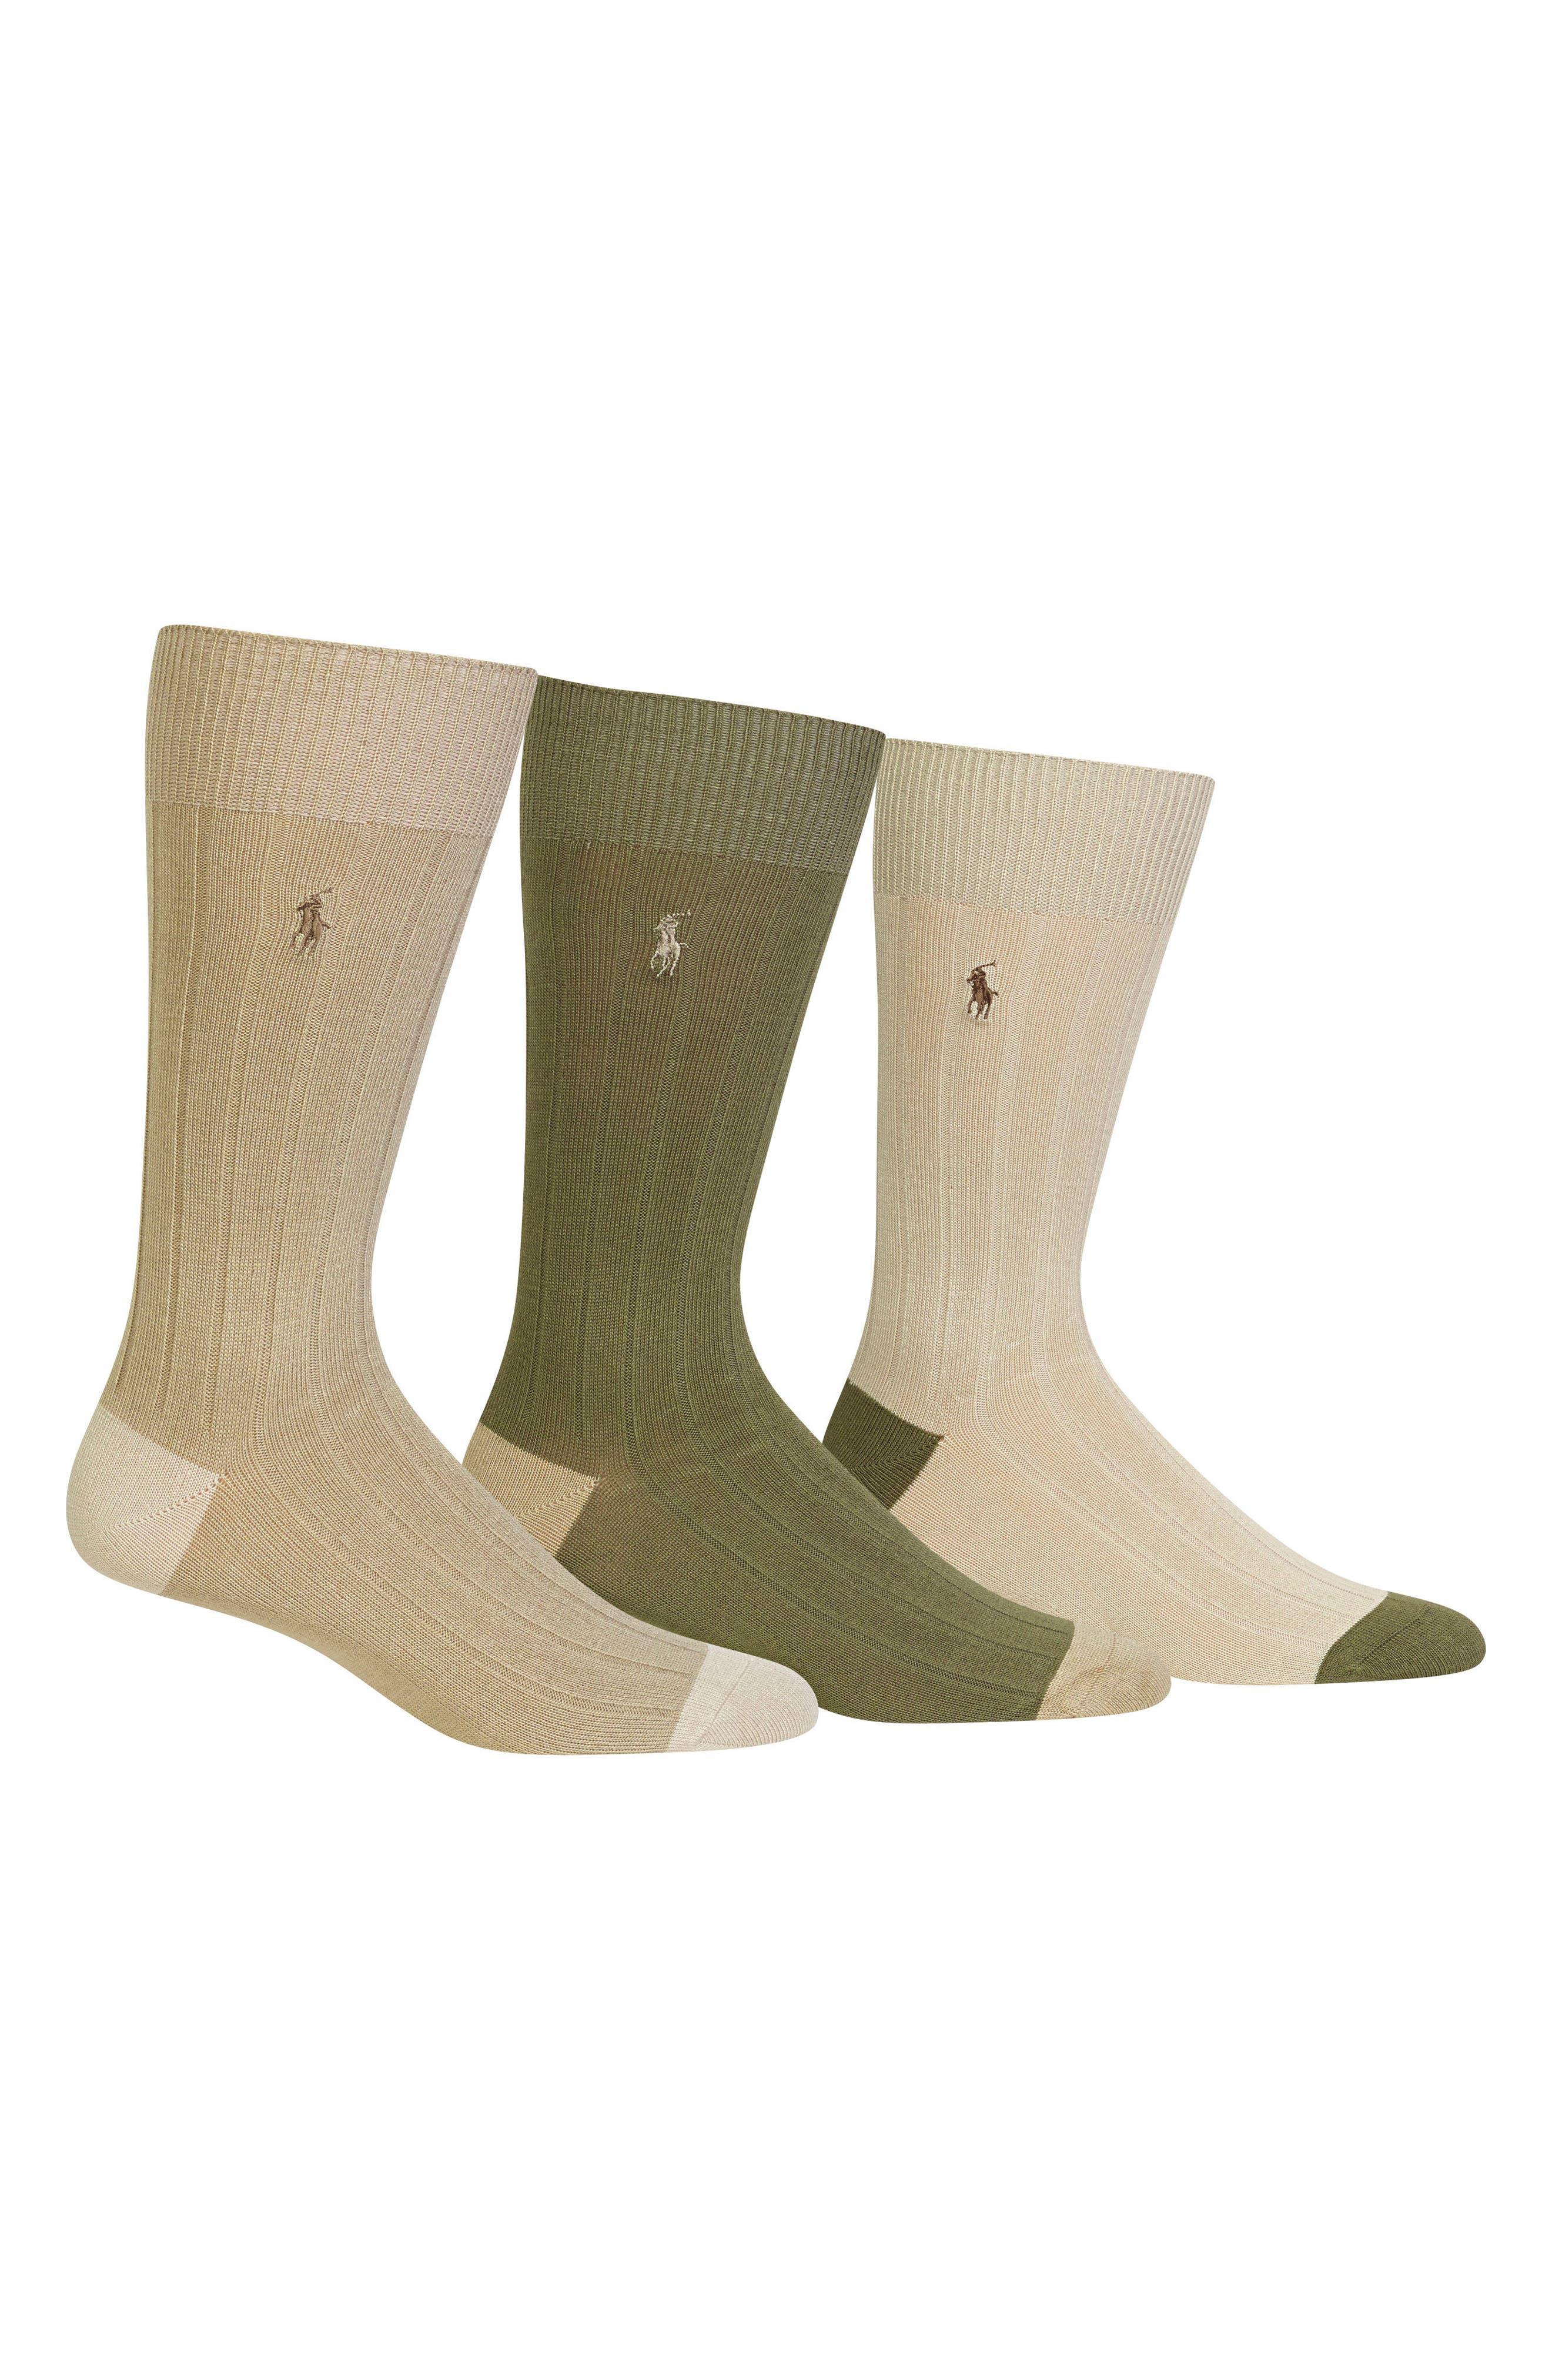 3-Pack Ribbed Socks,                             Main thumbnail 1, color,                             KHAKI ASSORTED